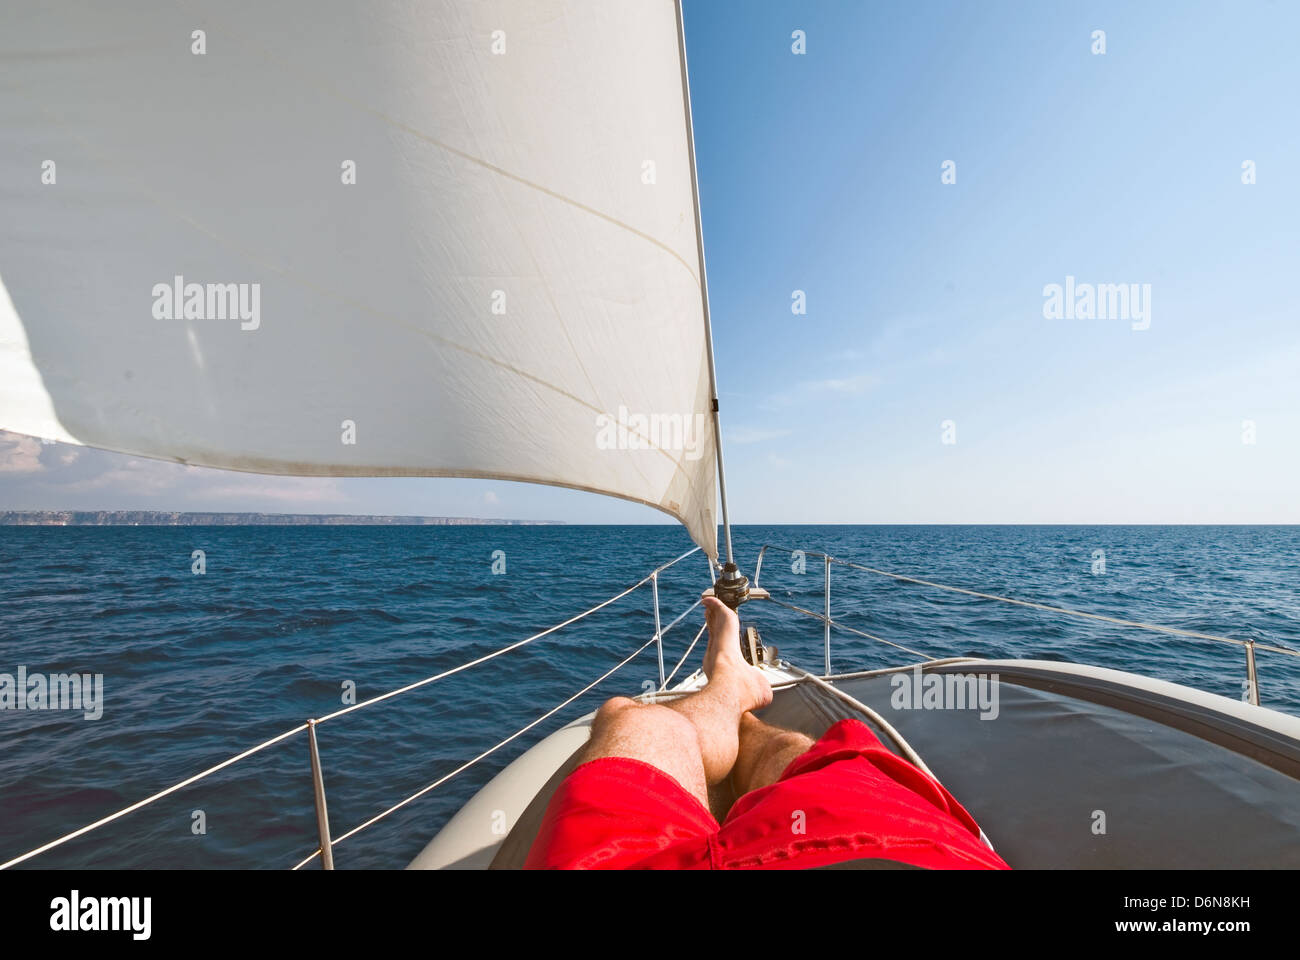 enjoyment,relaxation,leisure,relaxation,recreation,sail,sailboat,sailing - Stock Image